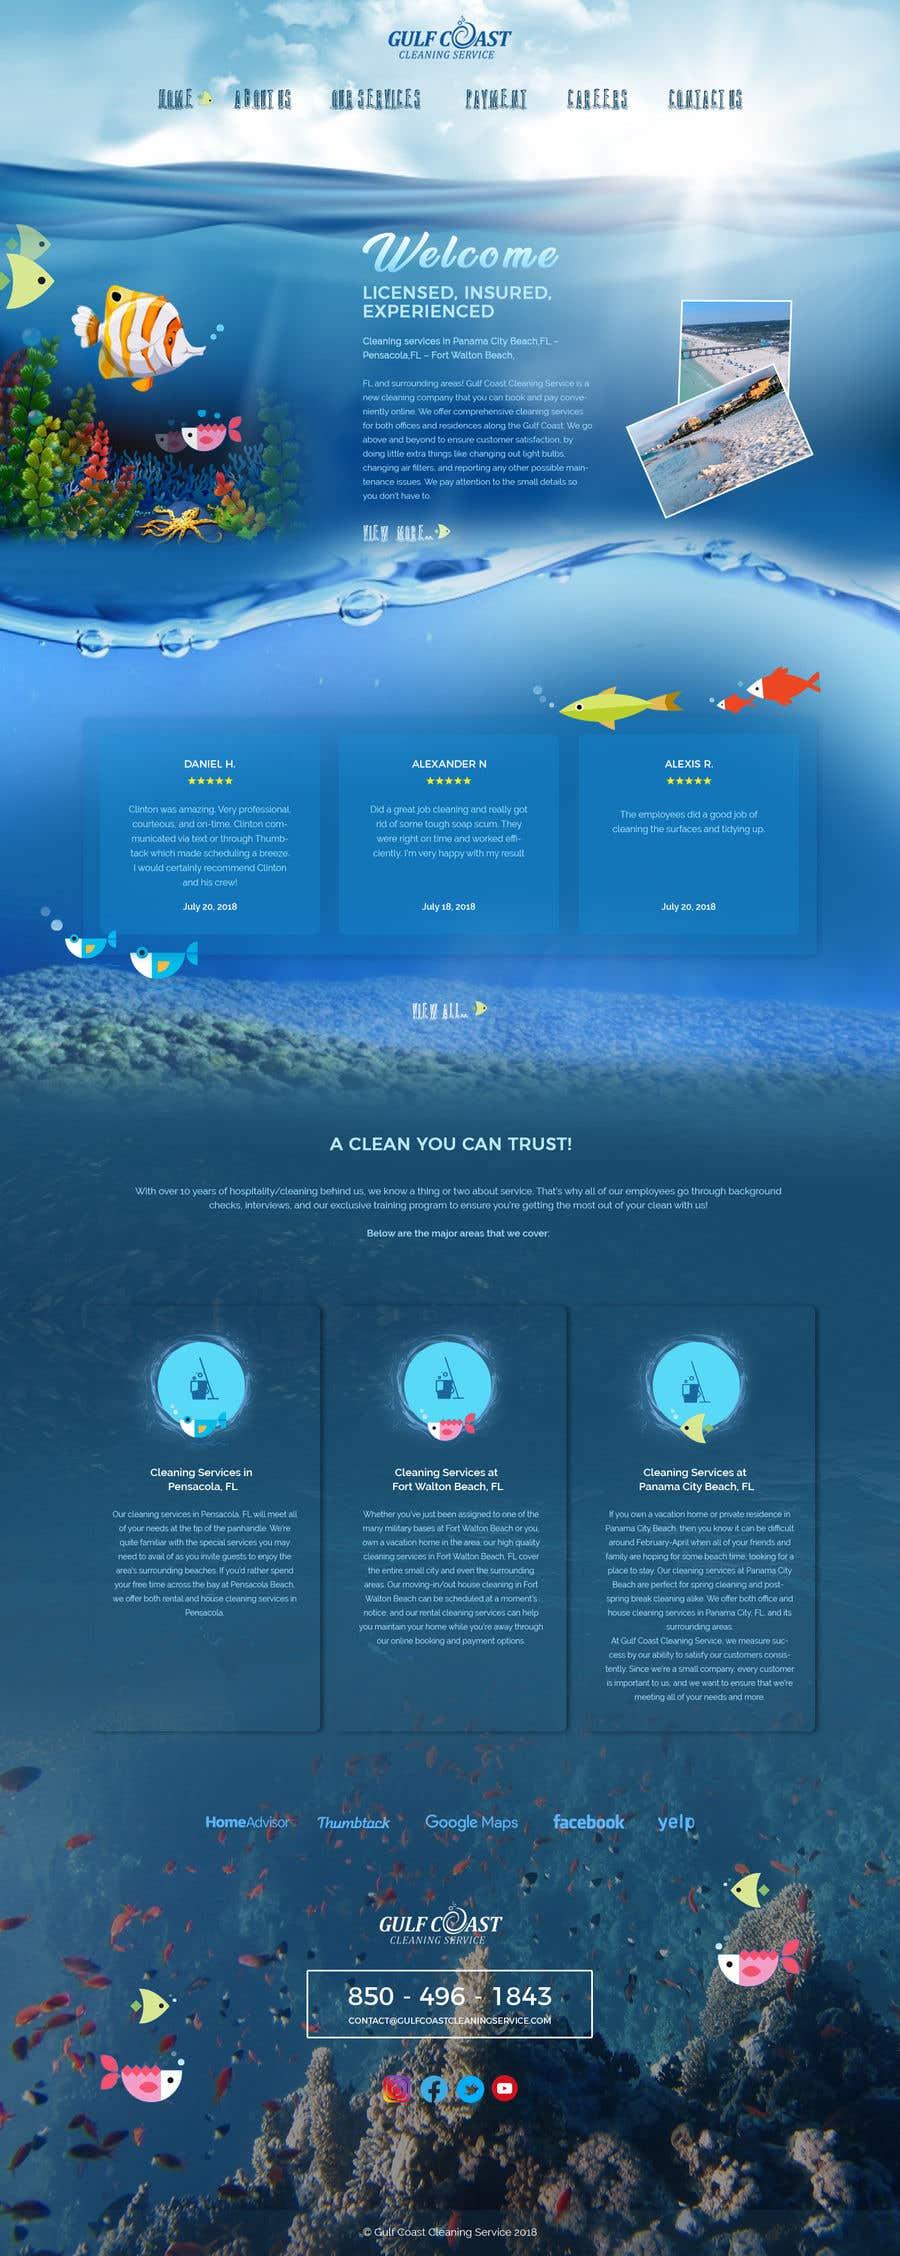 Kilpailutyö #8 kilpailussa Need a new updated homepage mockup